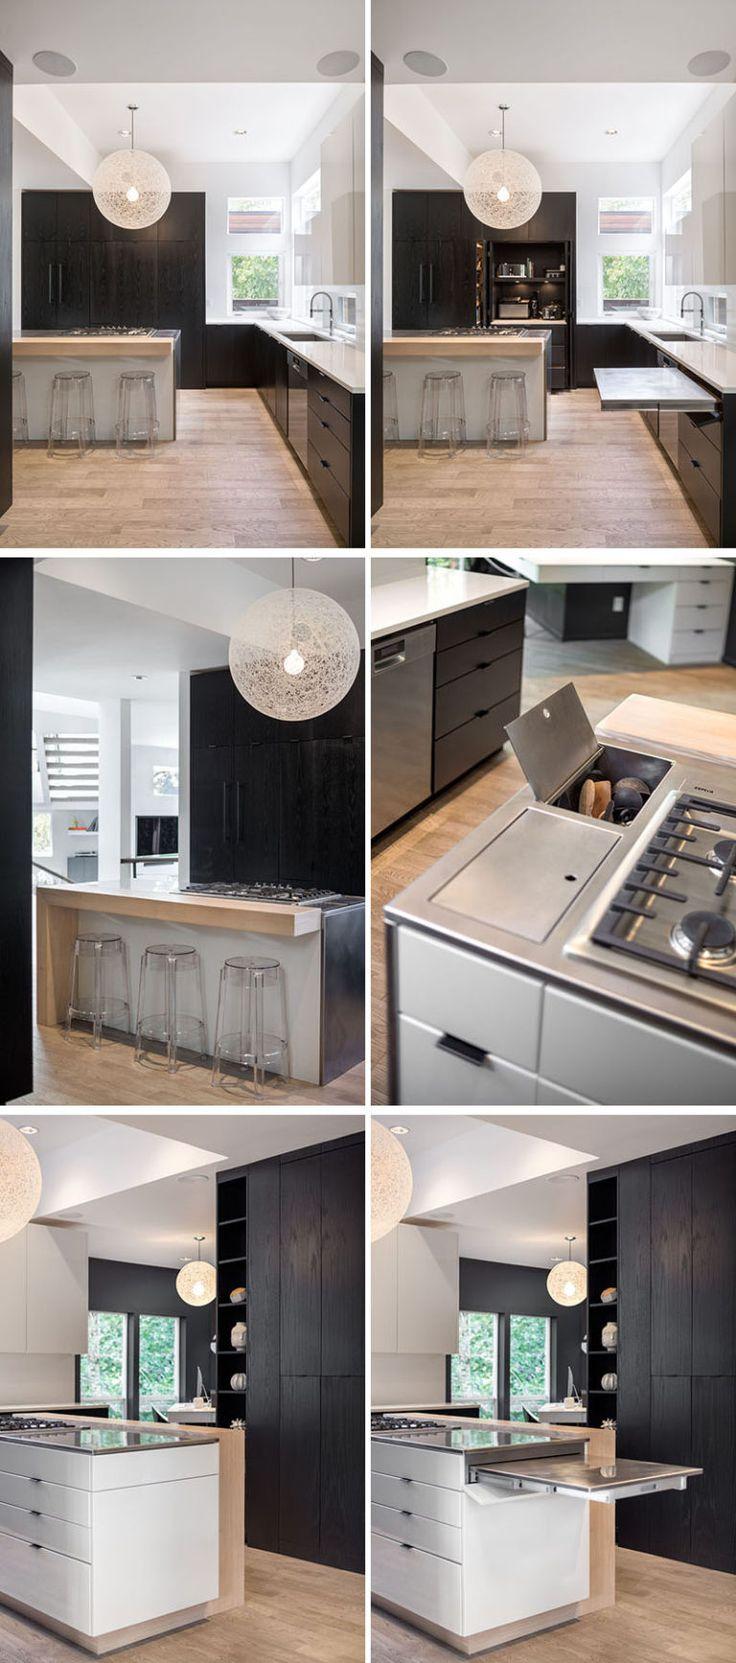 10 best BLANCO Kitchen Faucets images on Pinterest   Kitchen faucets ...